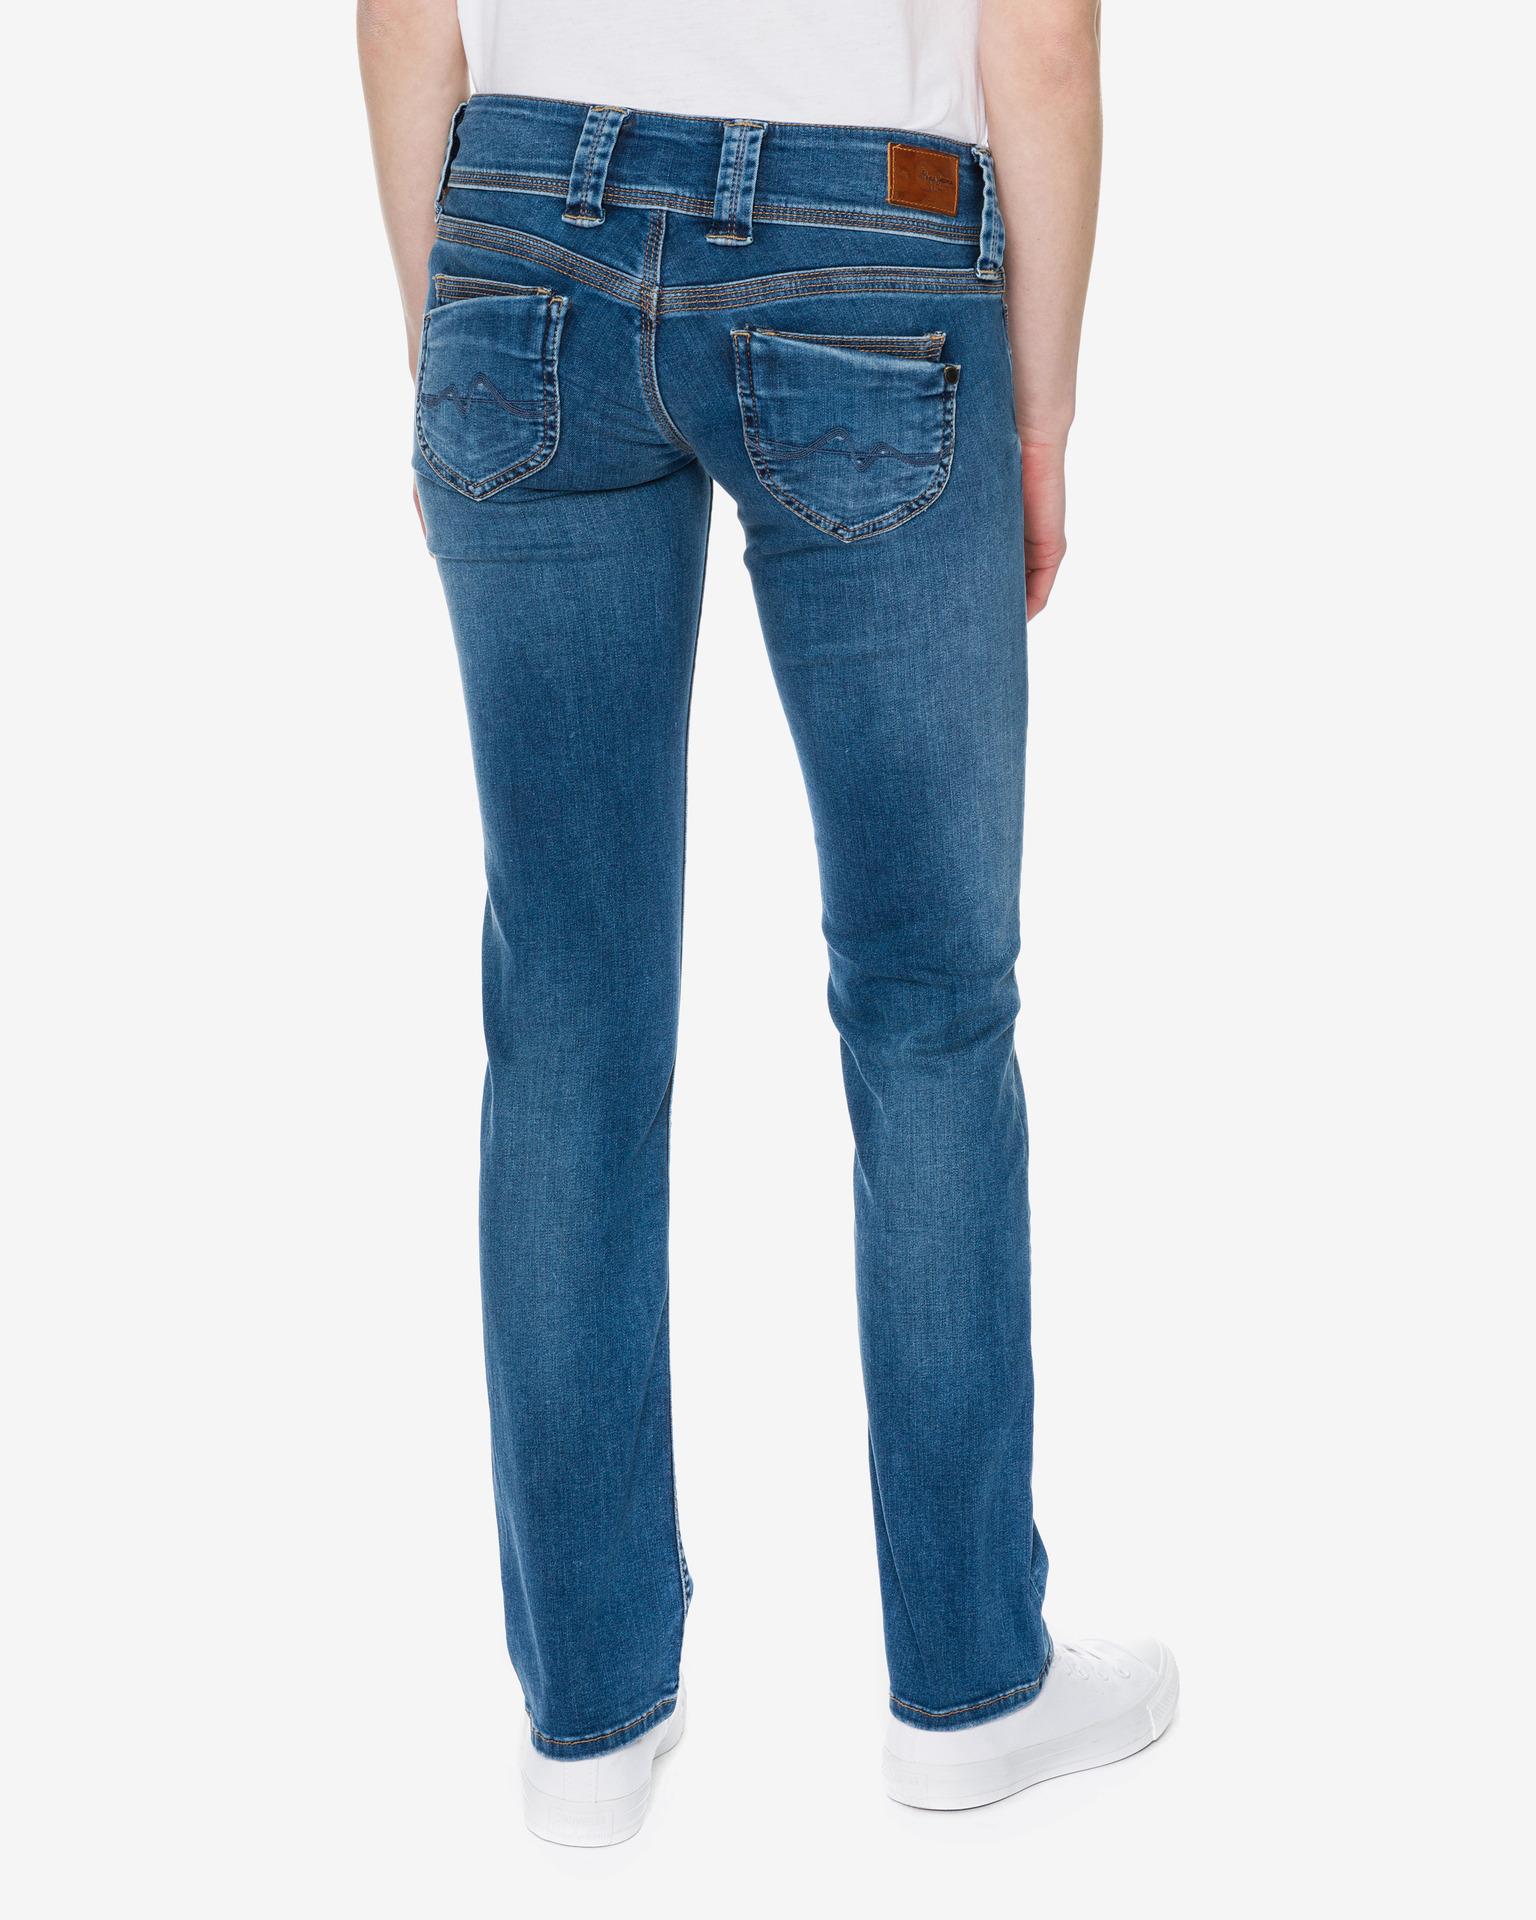 Pepe Jeans Venus Jeans Bibloo Com